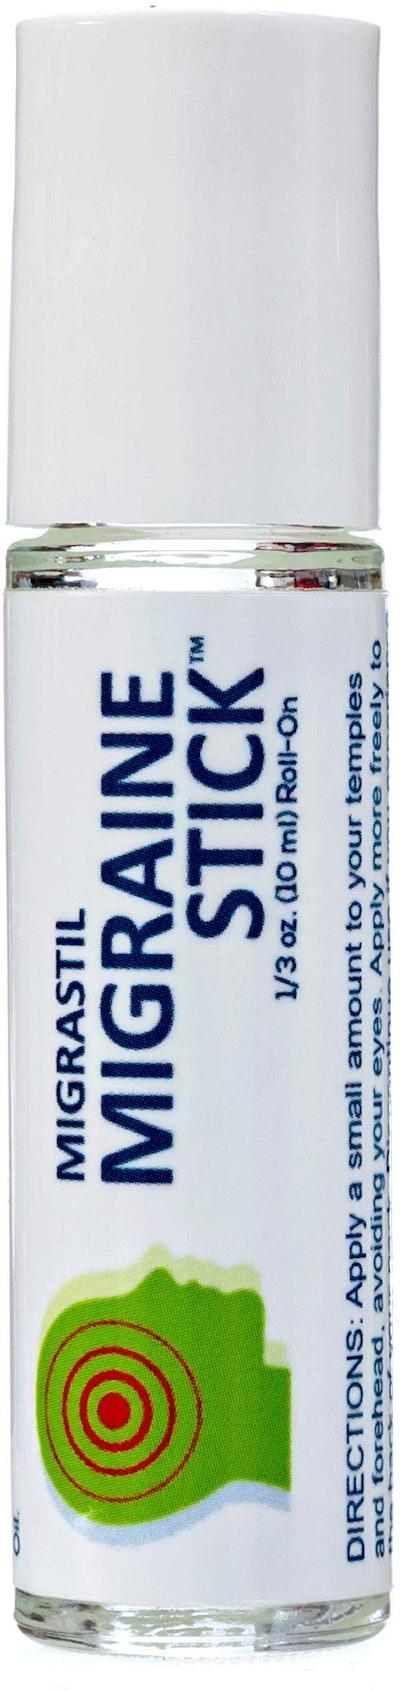 Migrastil Migraine Stick